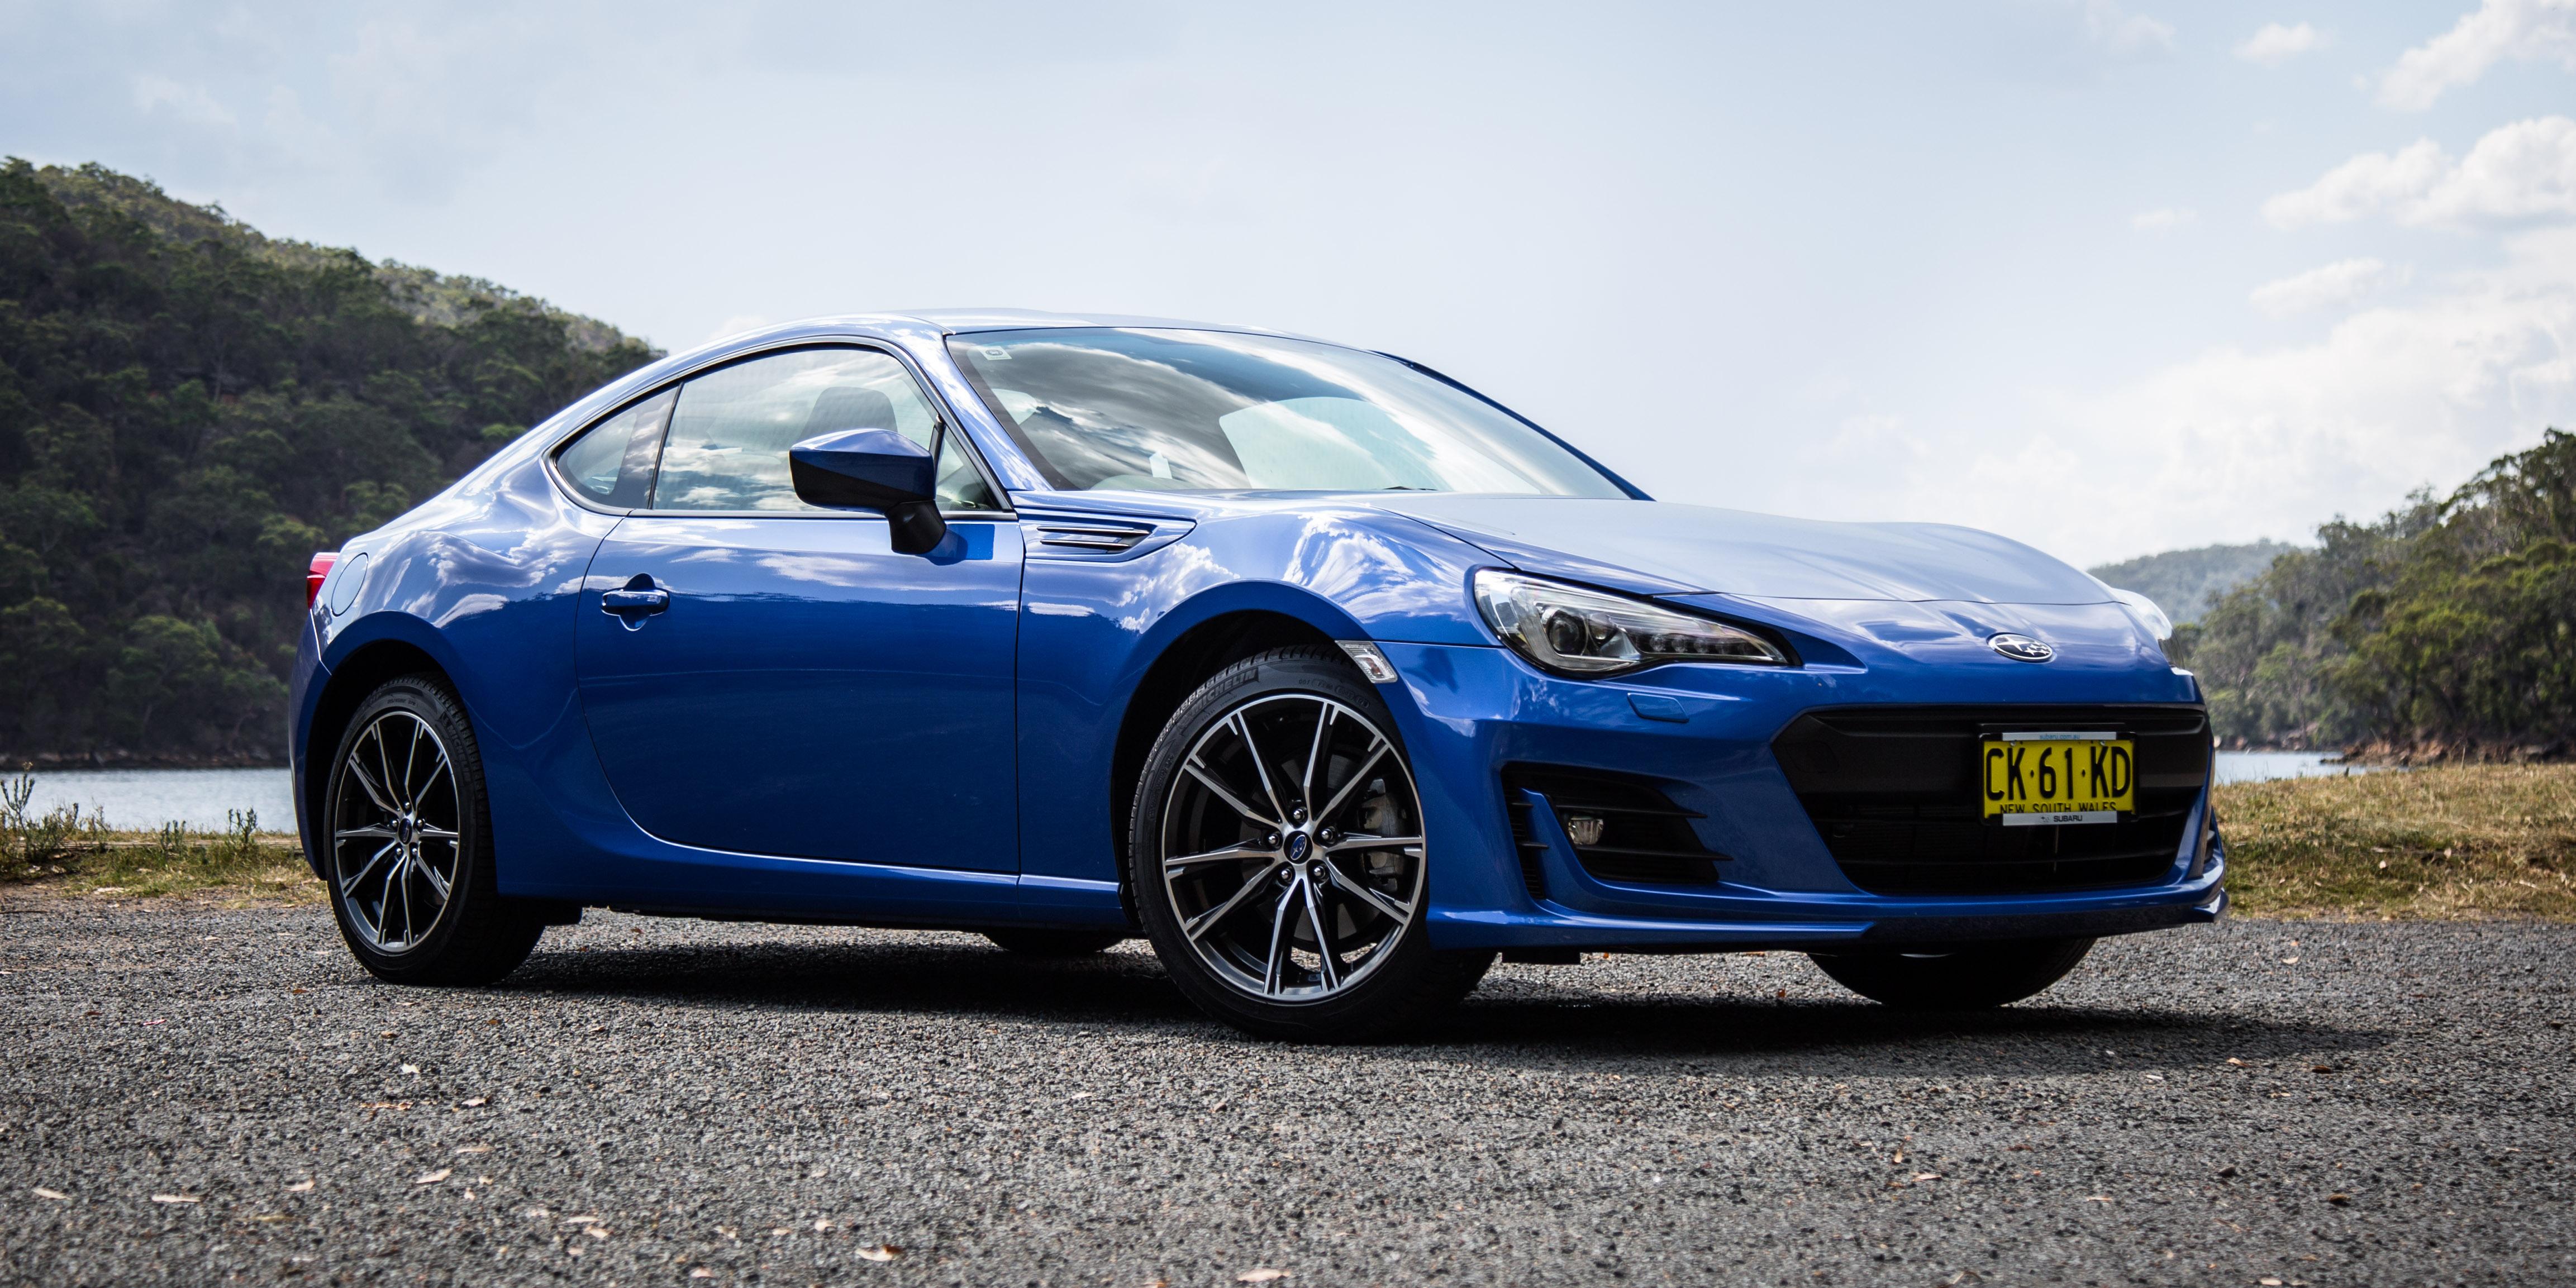 Mx 5 Rf Price >> Mazda MX-5 RF v Subaru BRZ comparison - Photos (1 of 95)